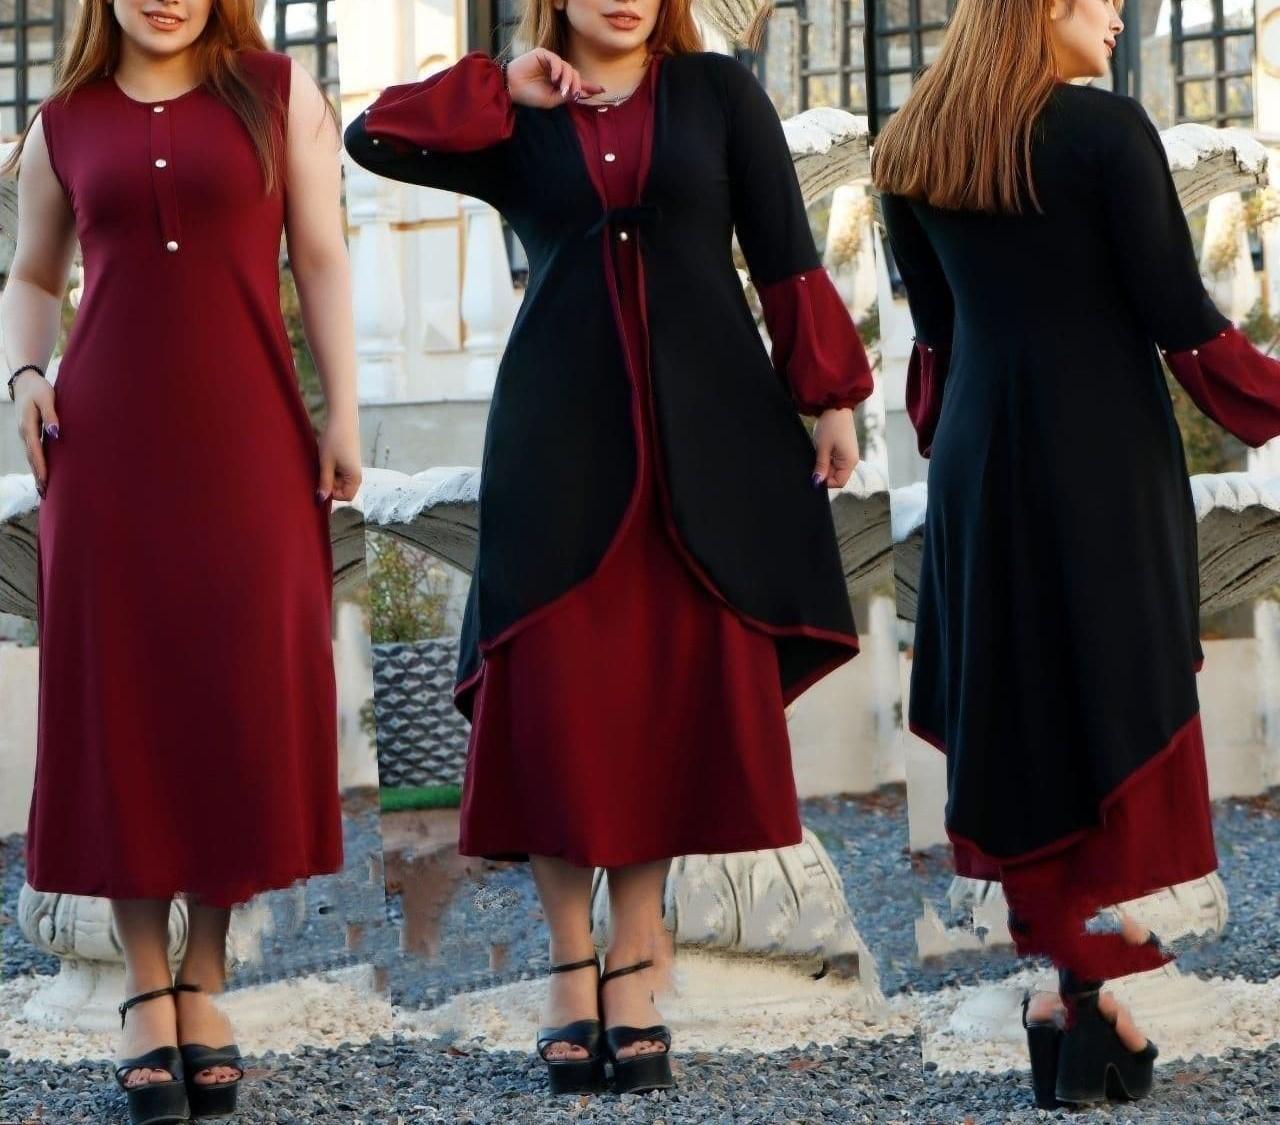 New model spring clothes 1400 pabak.ir 14 - مدل های جدید لباس بهار ۱۴۰۰ + عکس